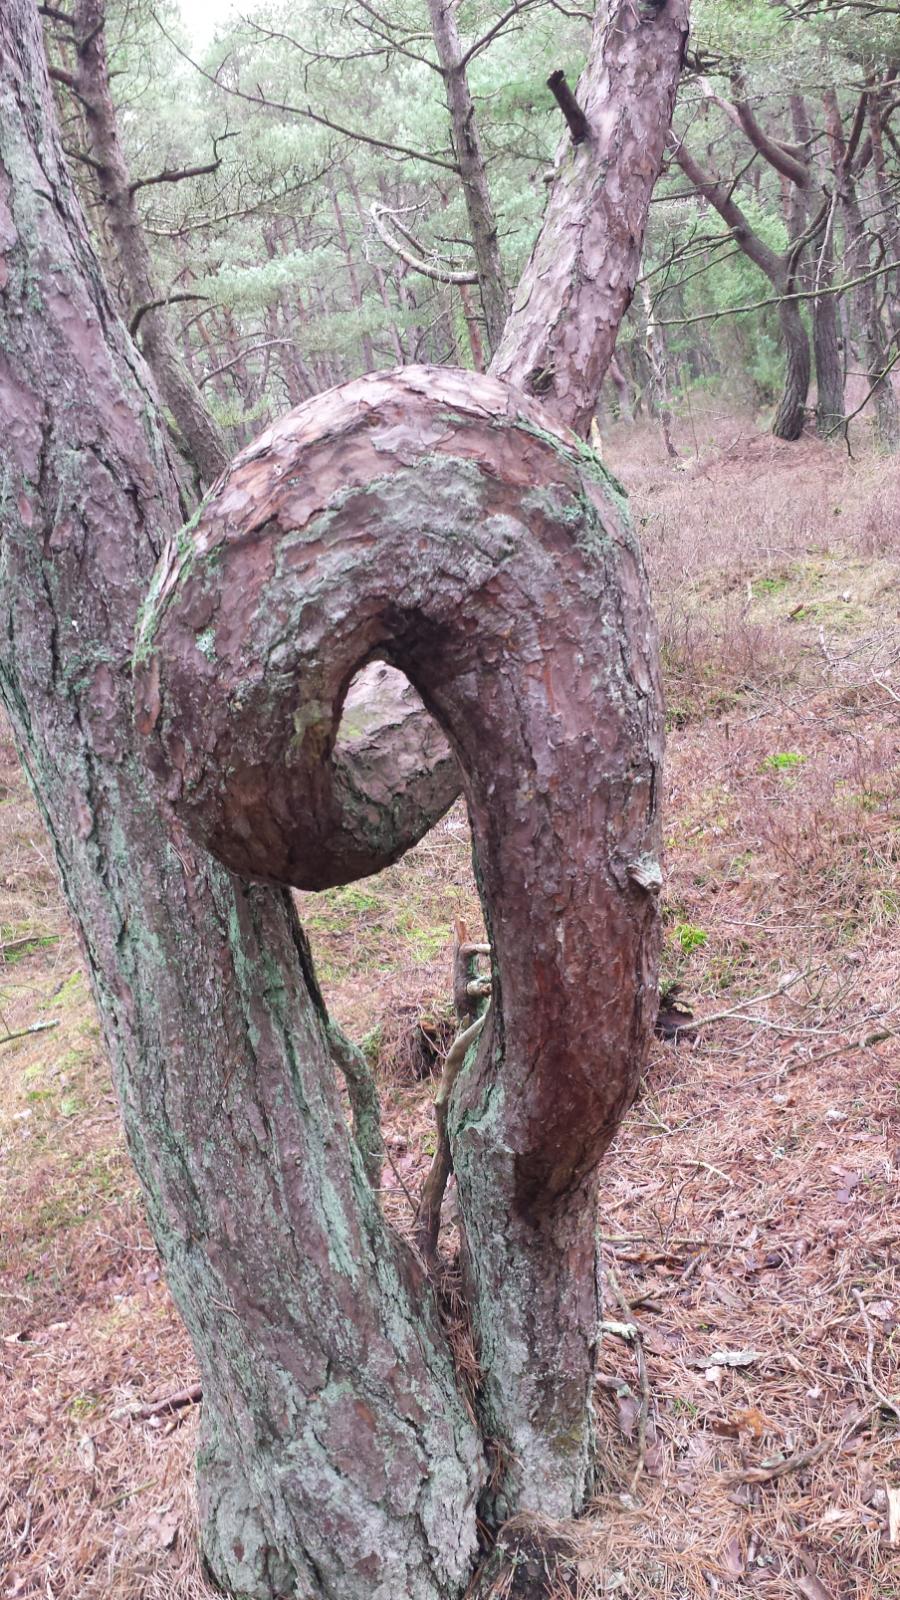 Foto: Iben Østerbye. Troldeskoven, Husby Plantage